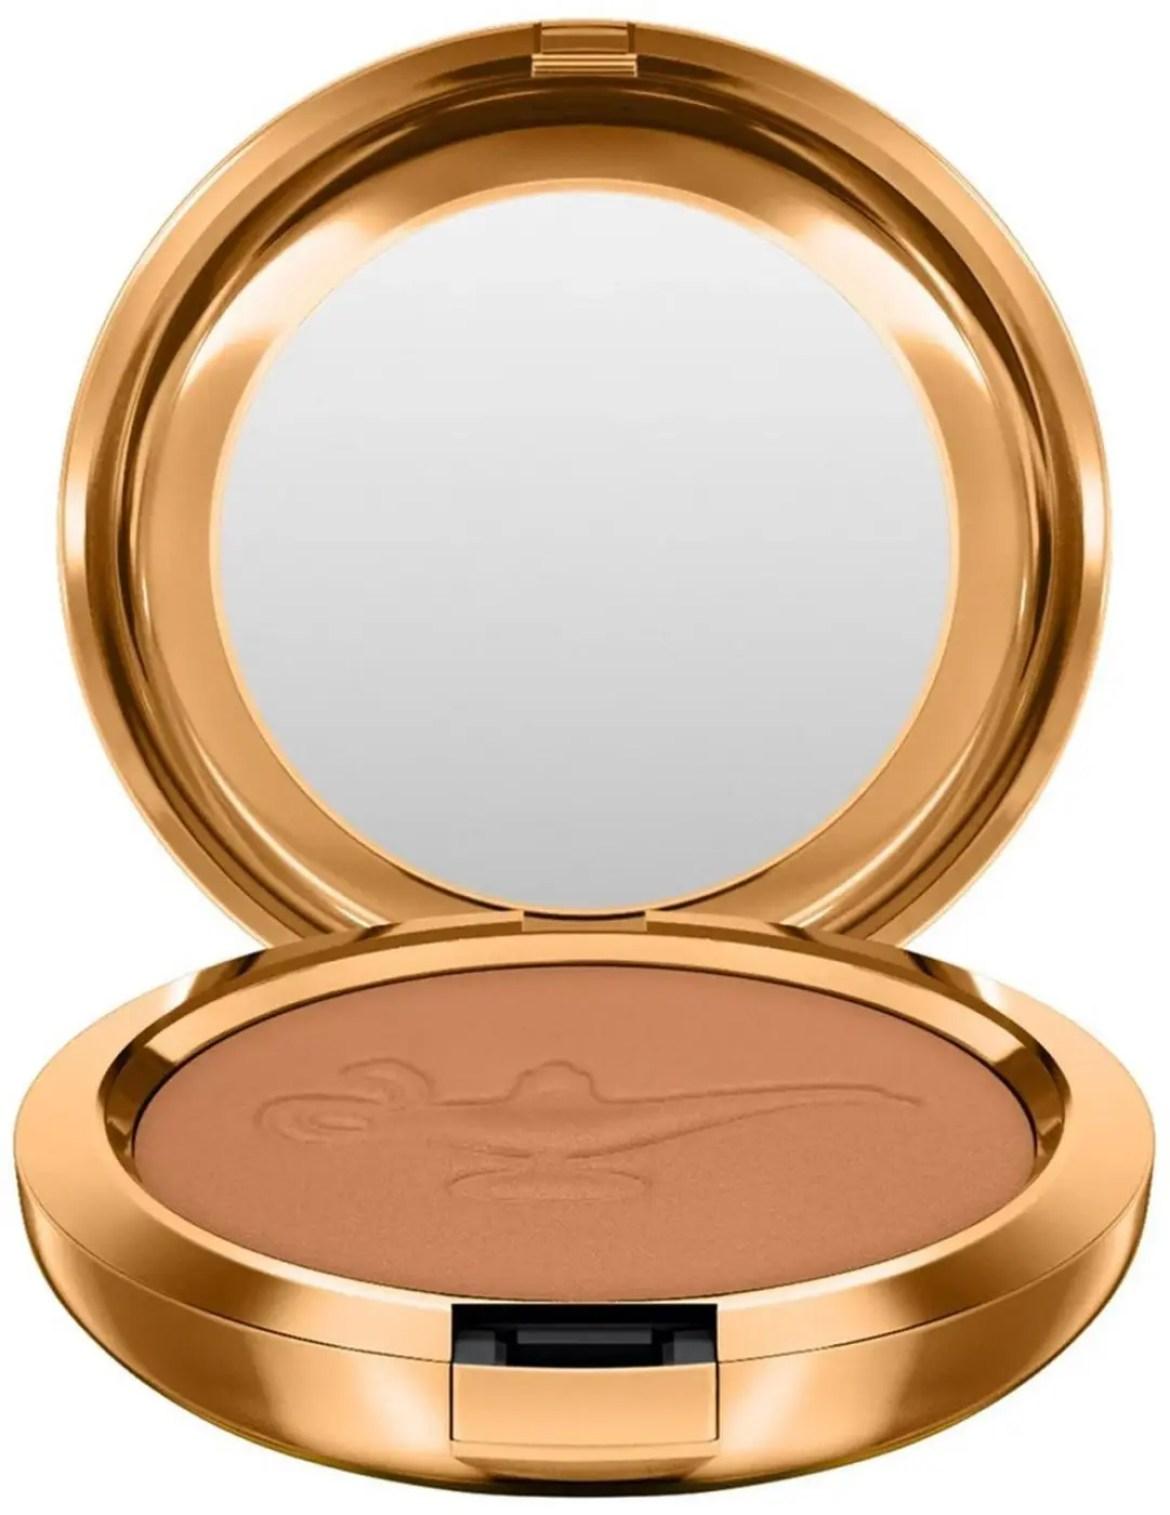 Mac Cosmetics Disney Aladdin Collection-02